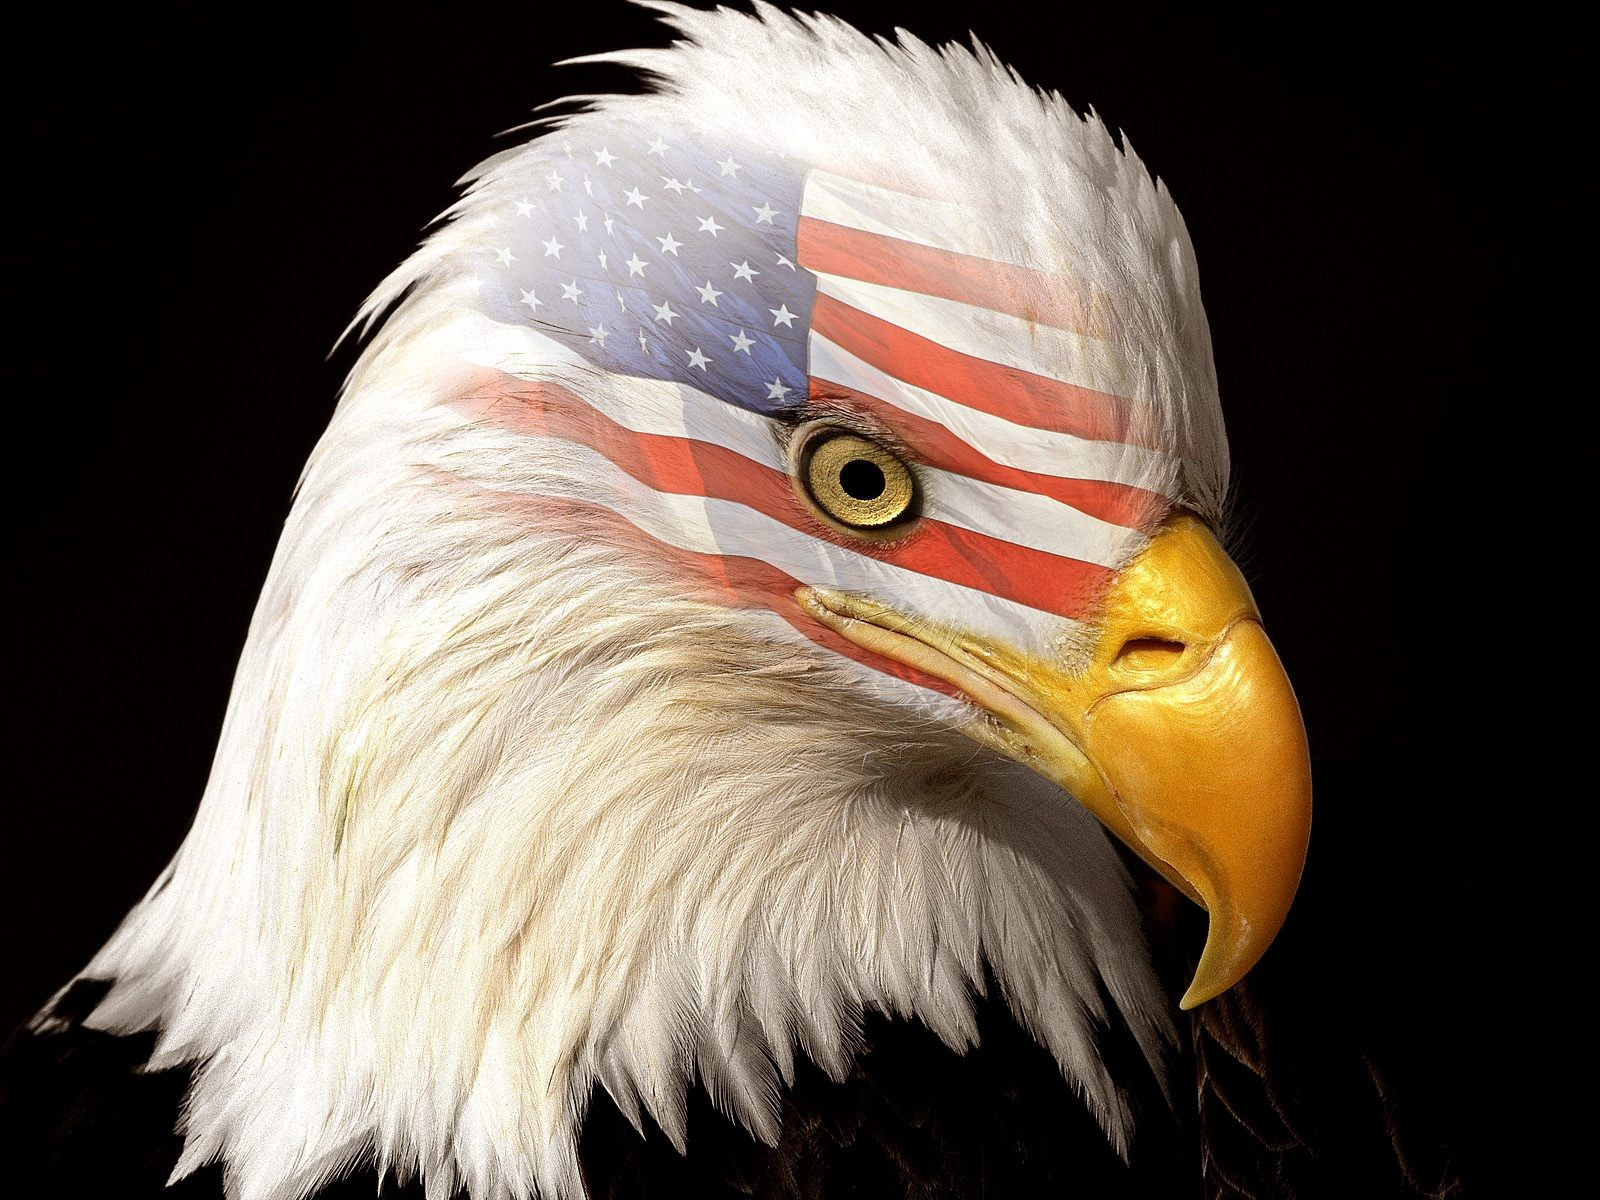 Eagles Flags Wallpaper 1600x1200 Eagles Flags USA Bald Eagles 1600x1200